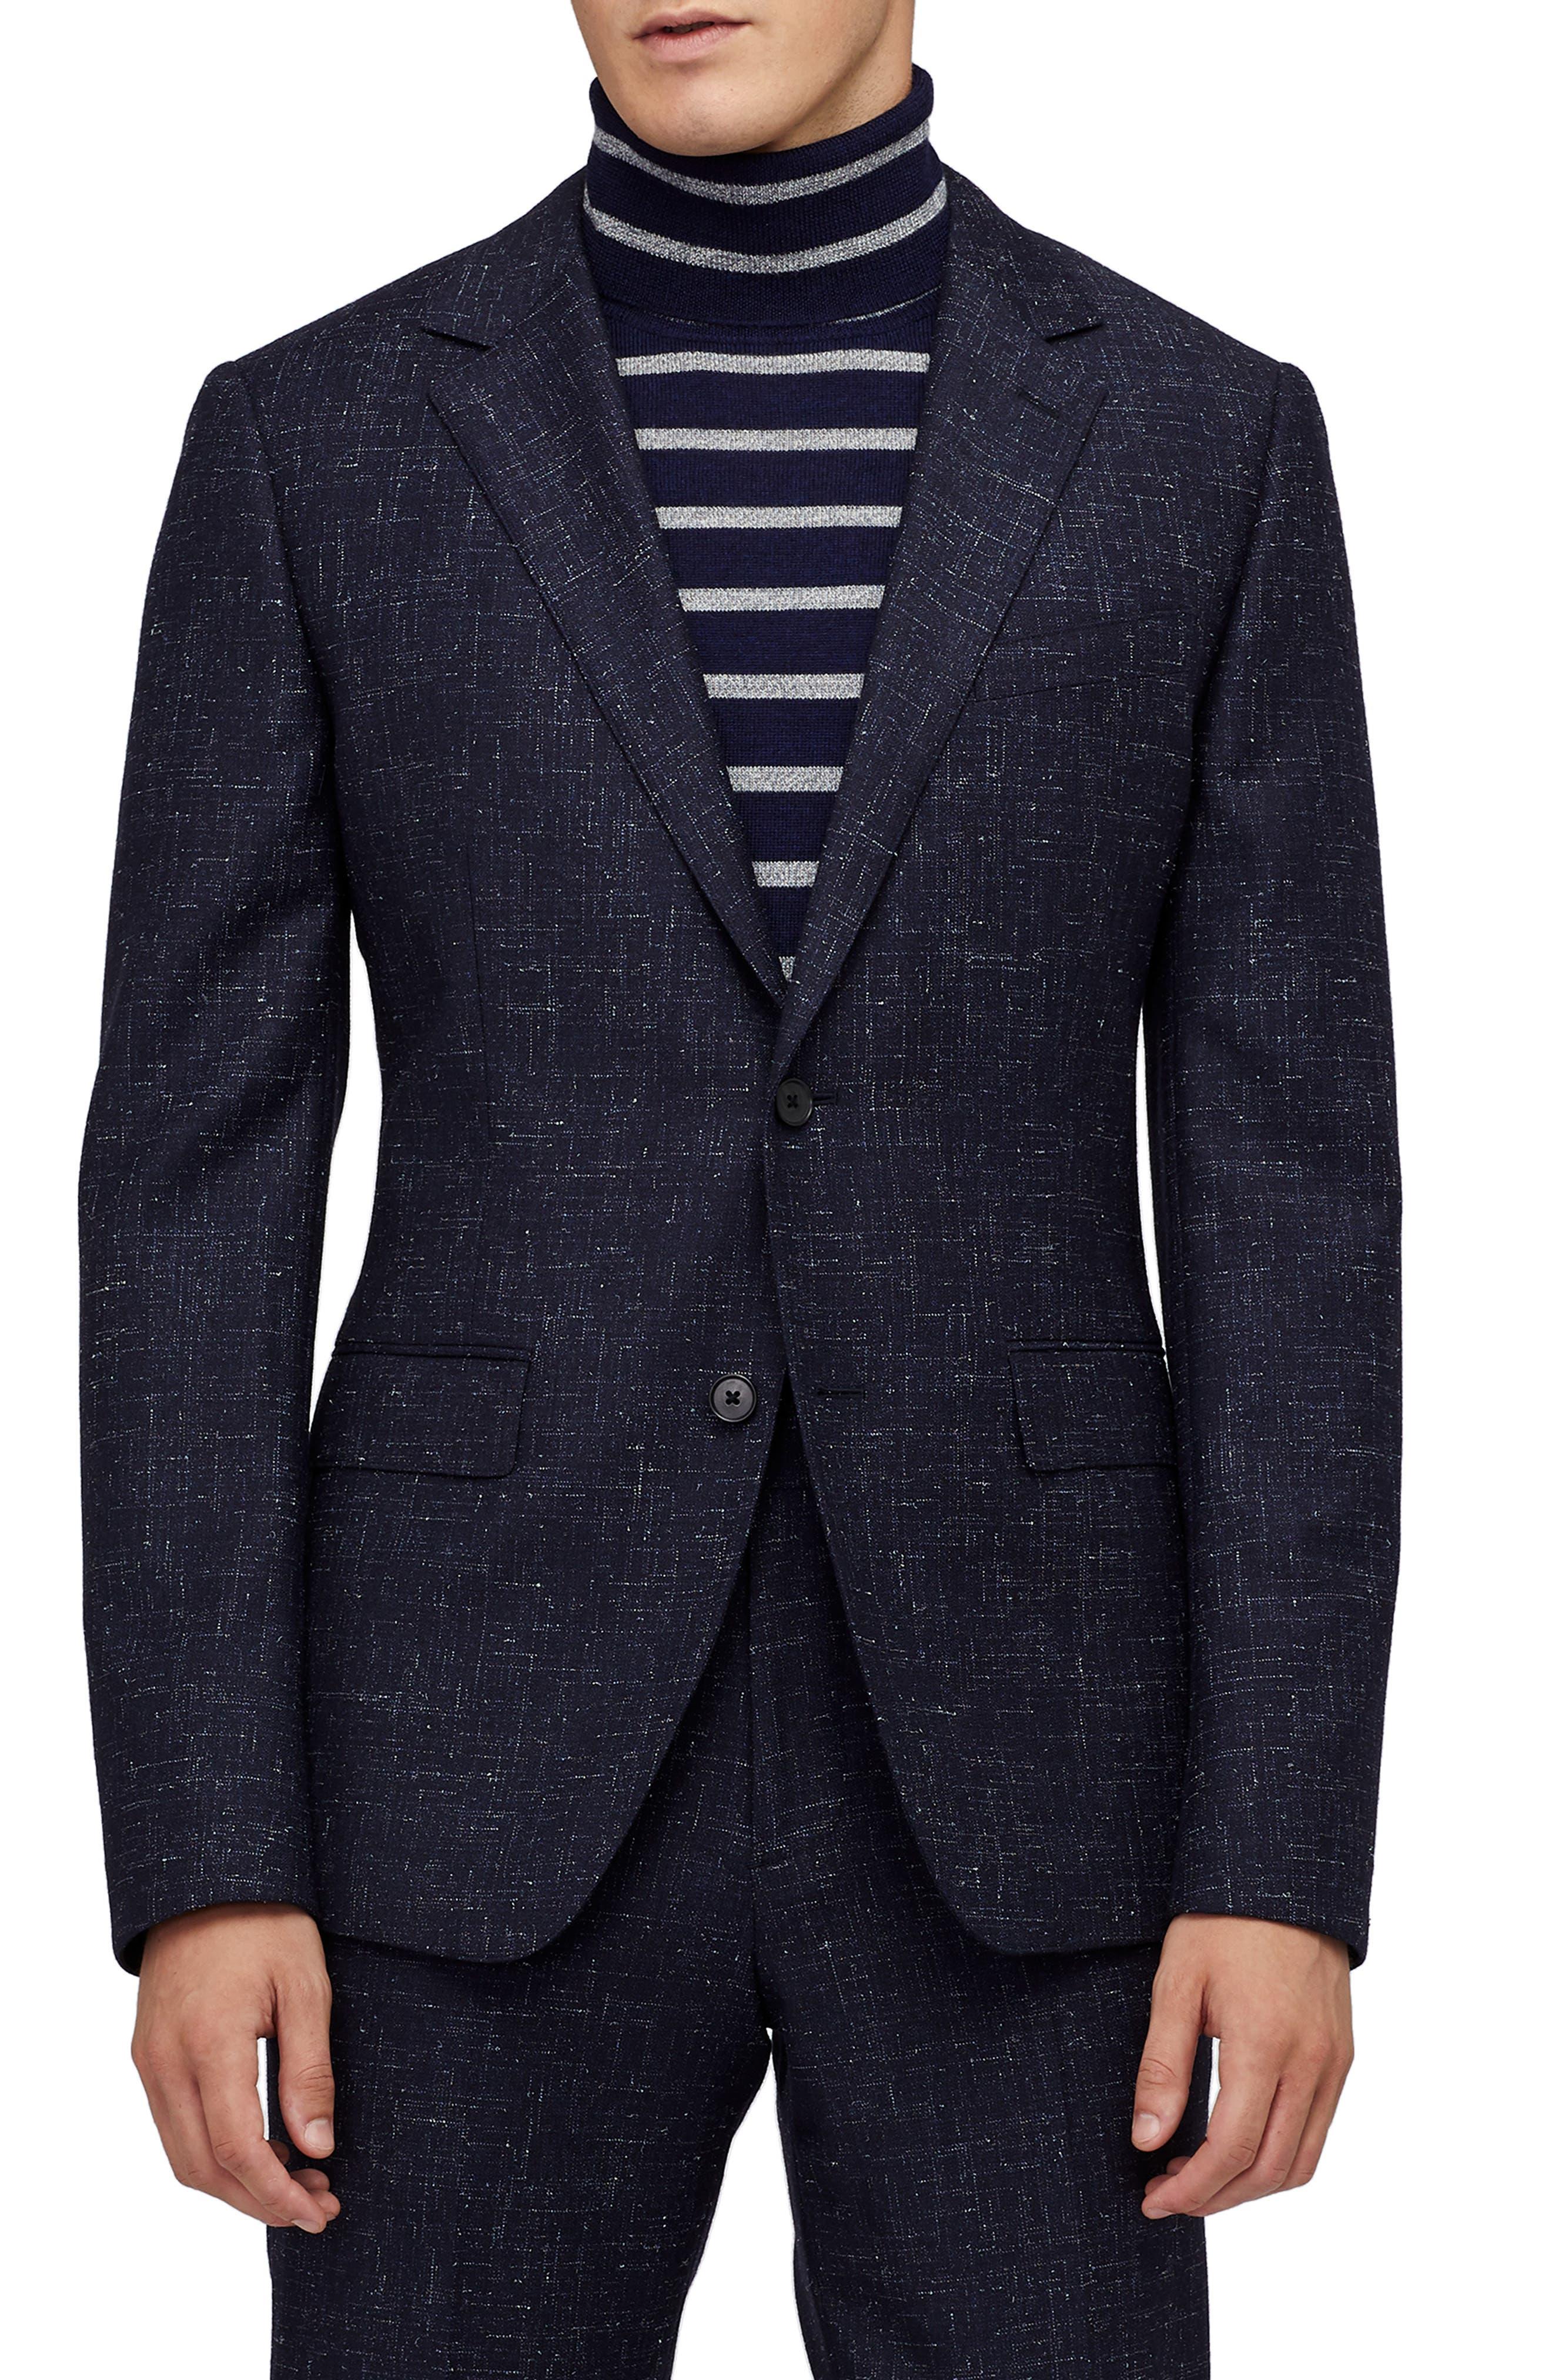 Jetsetter Crosshatch Wool Blend Blazer,                         Main,                         color, NAVY CROSS HATCH